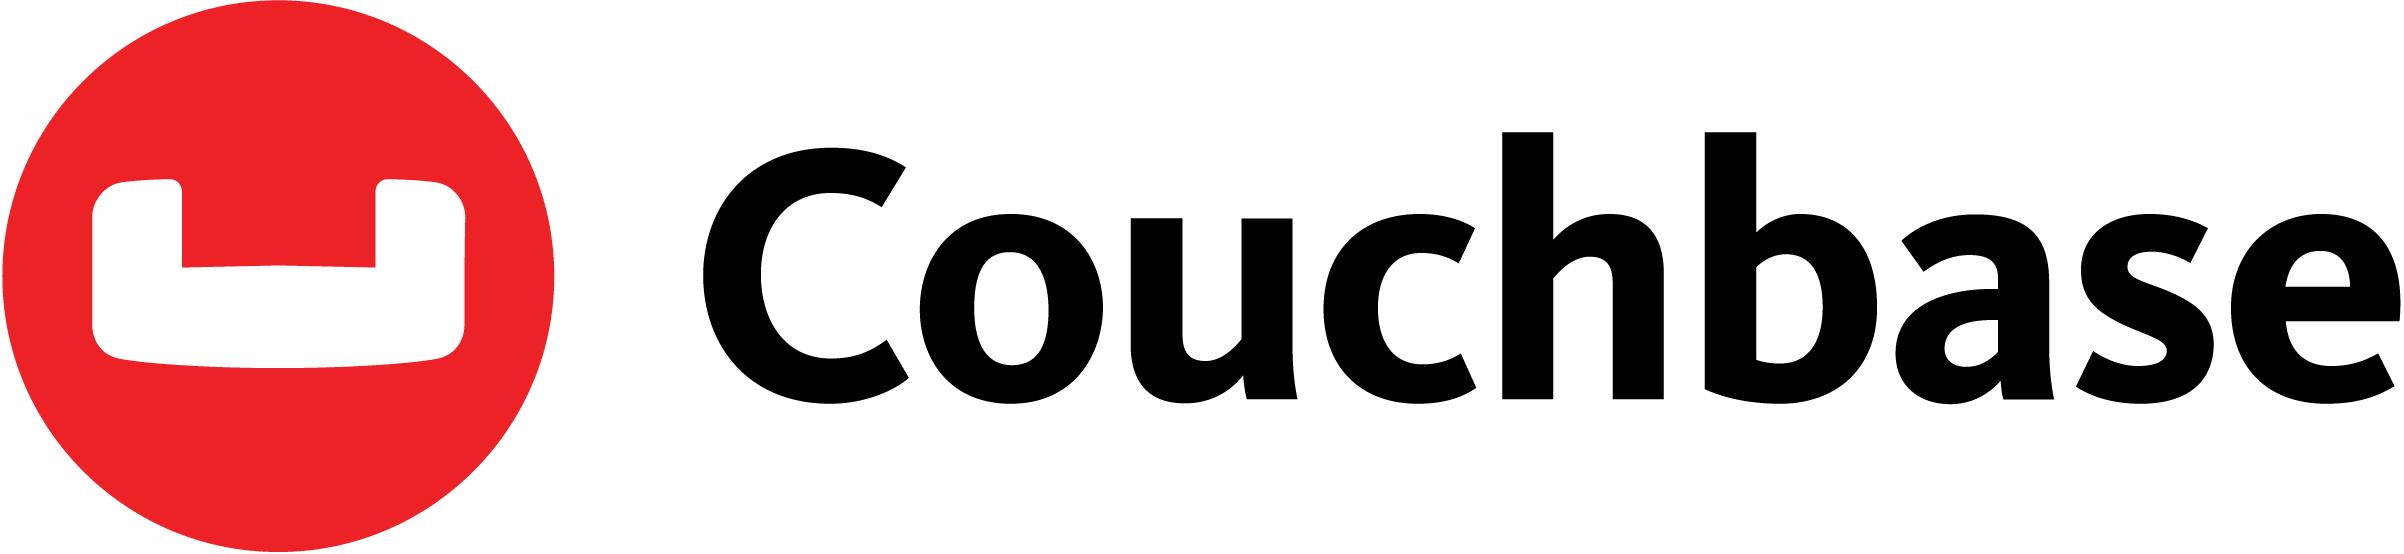 Couchbase Logo.